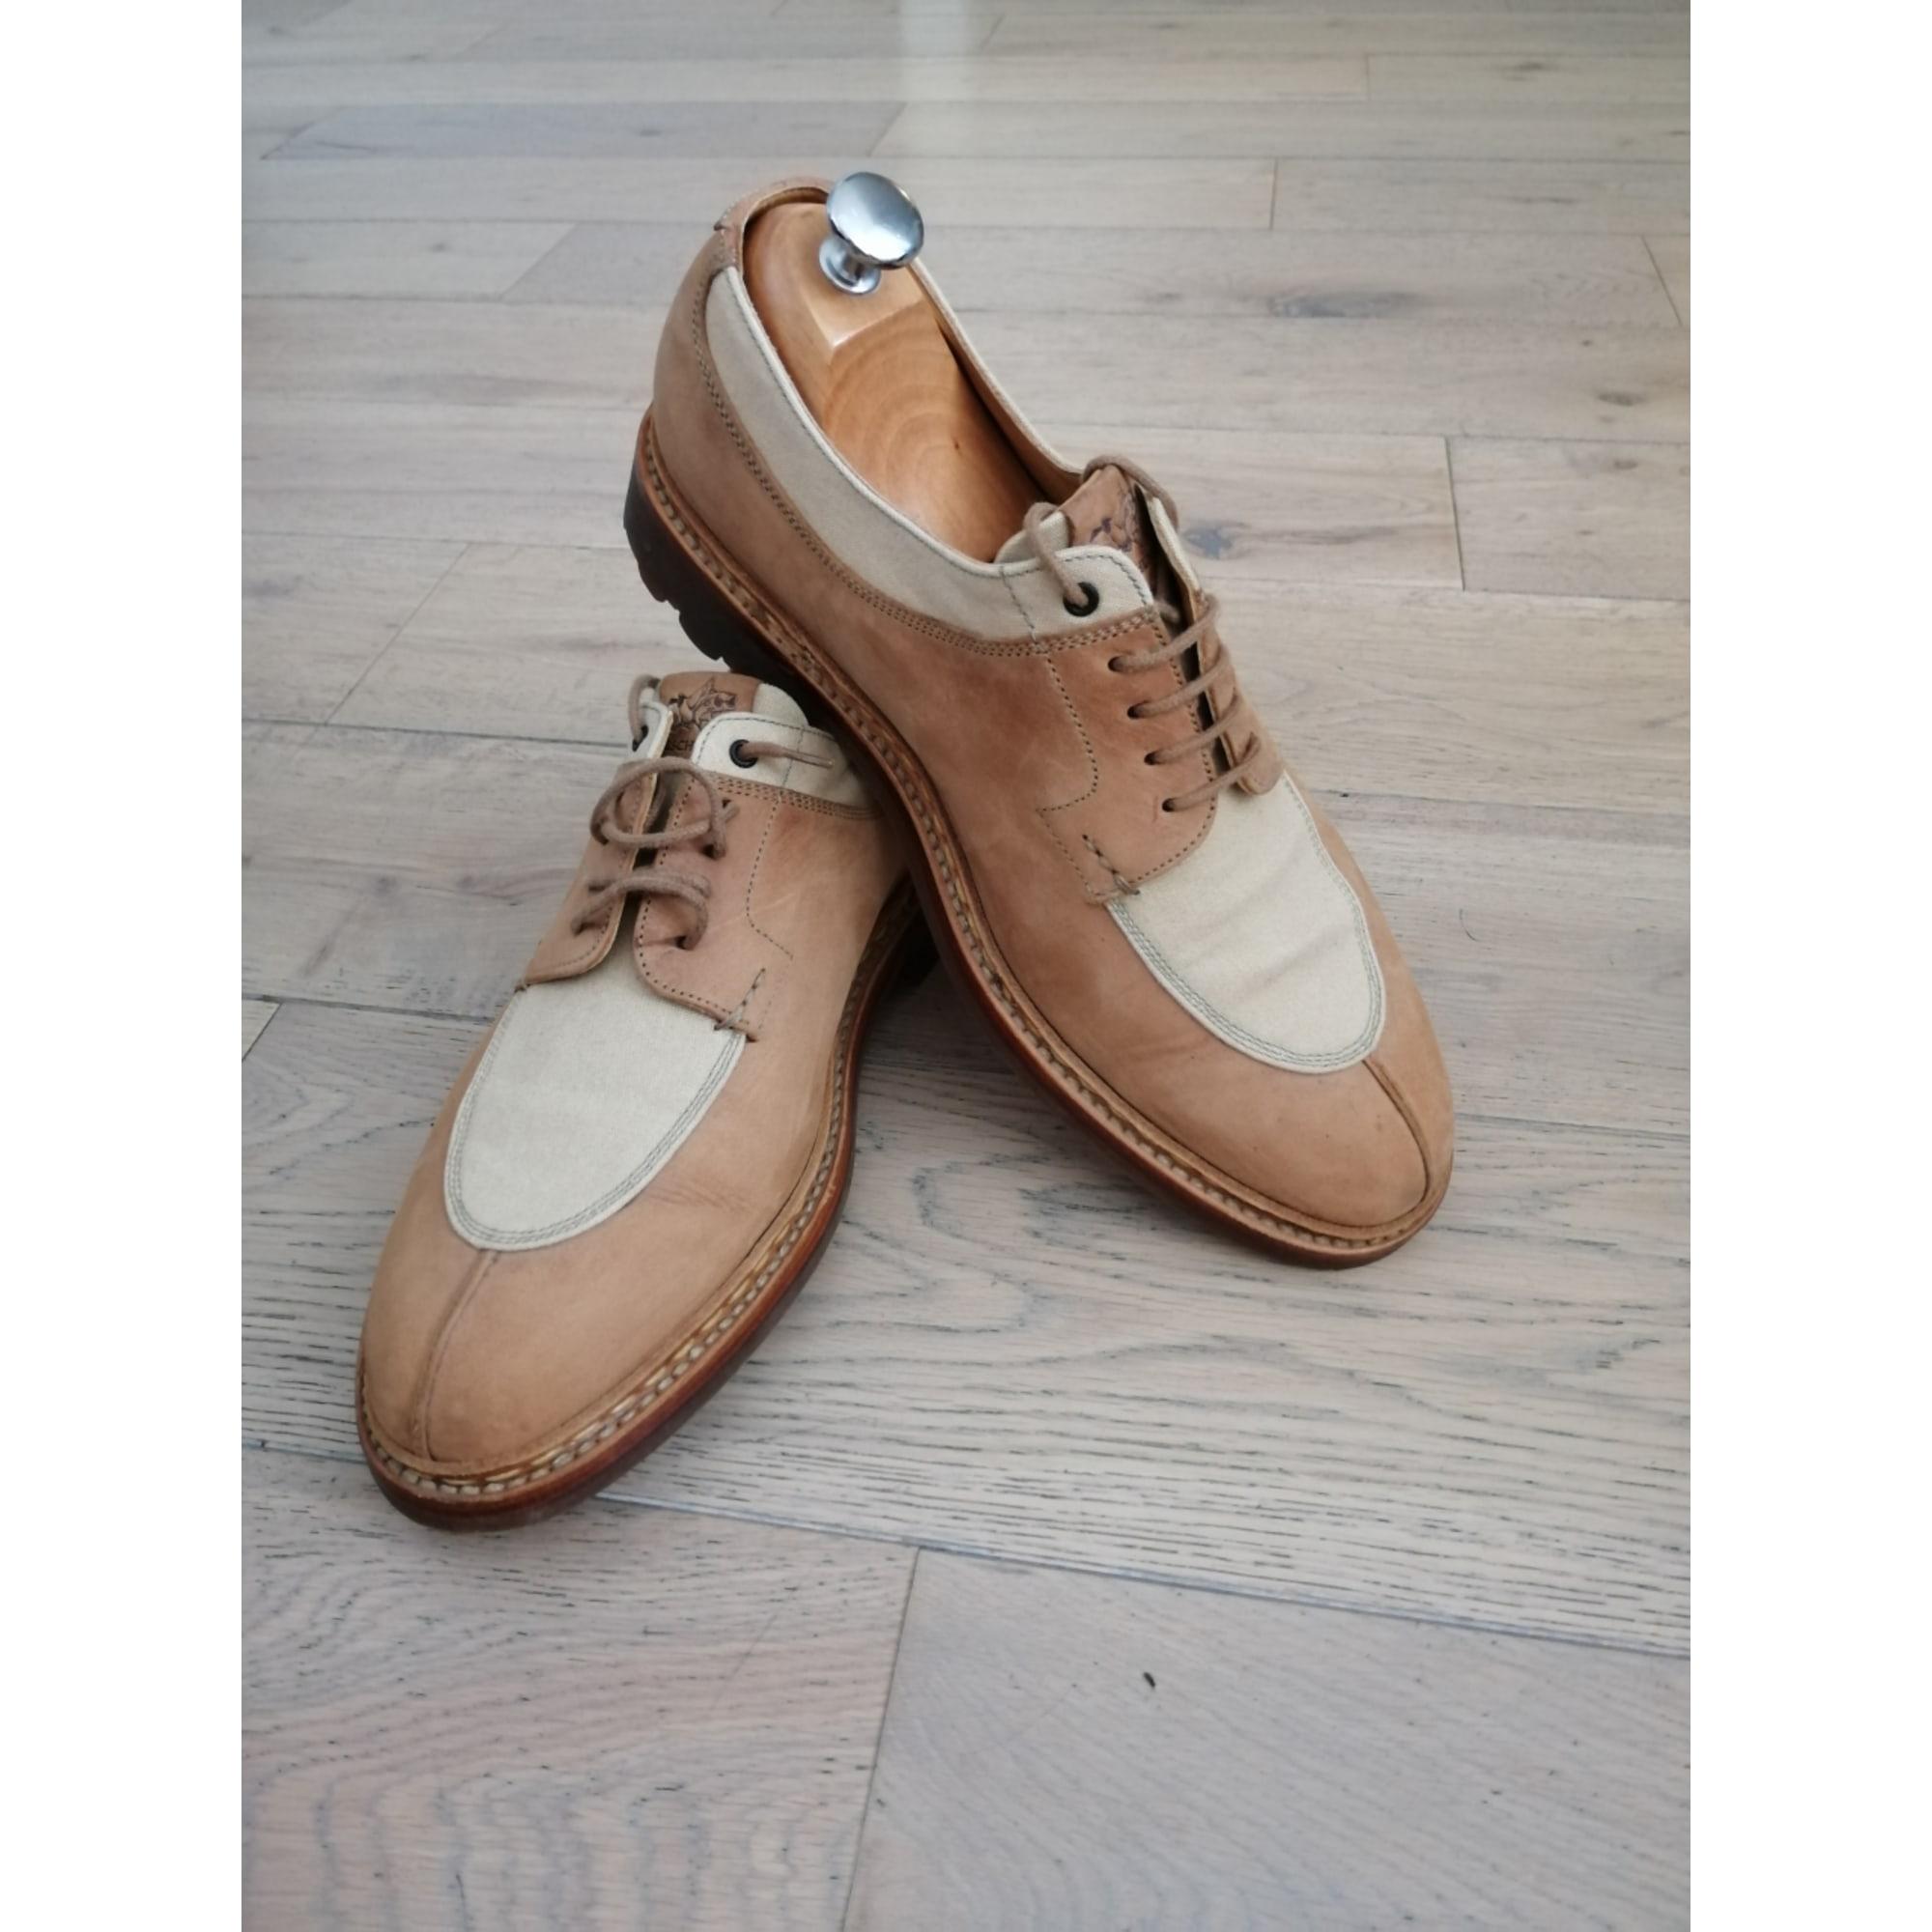 Chaussures à lacets HESCHUNG Beige, camel